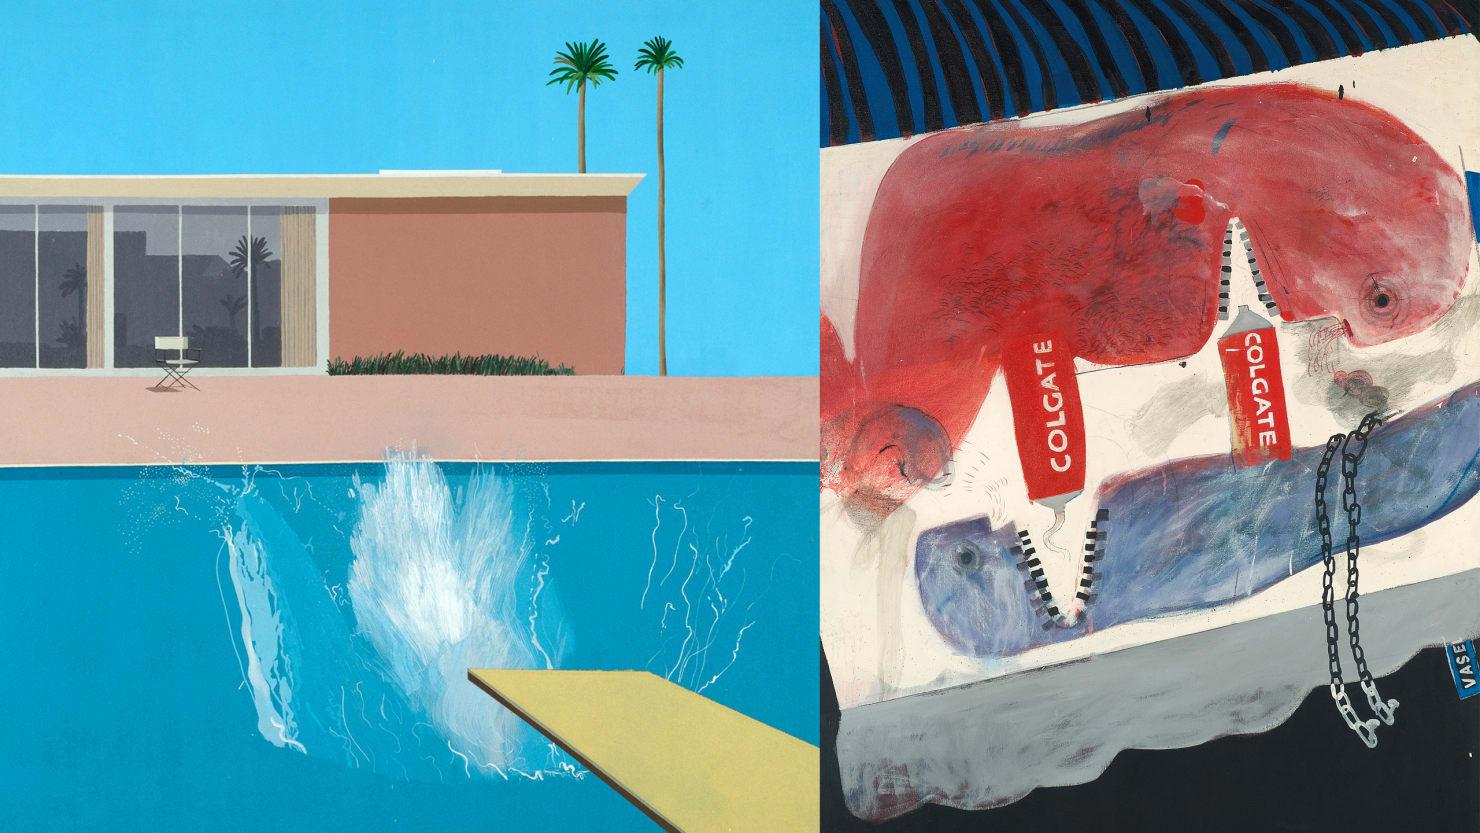 Swimming In The Sexy Genius Of David Hockney